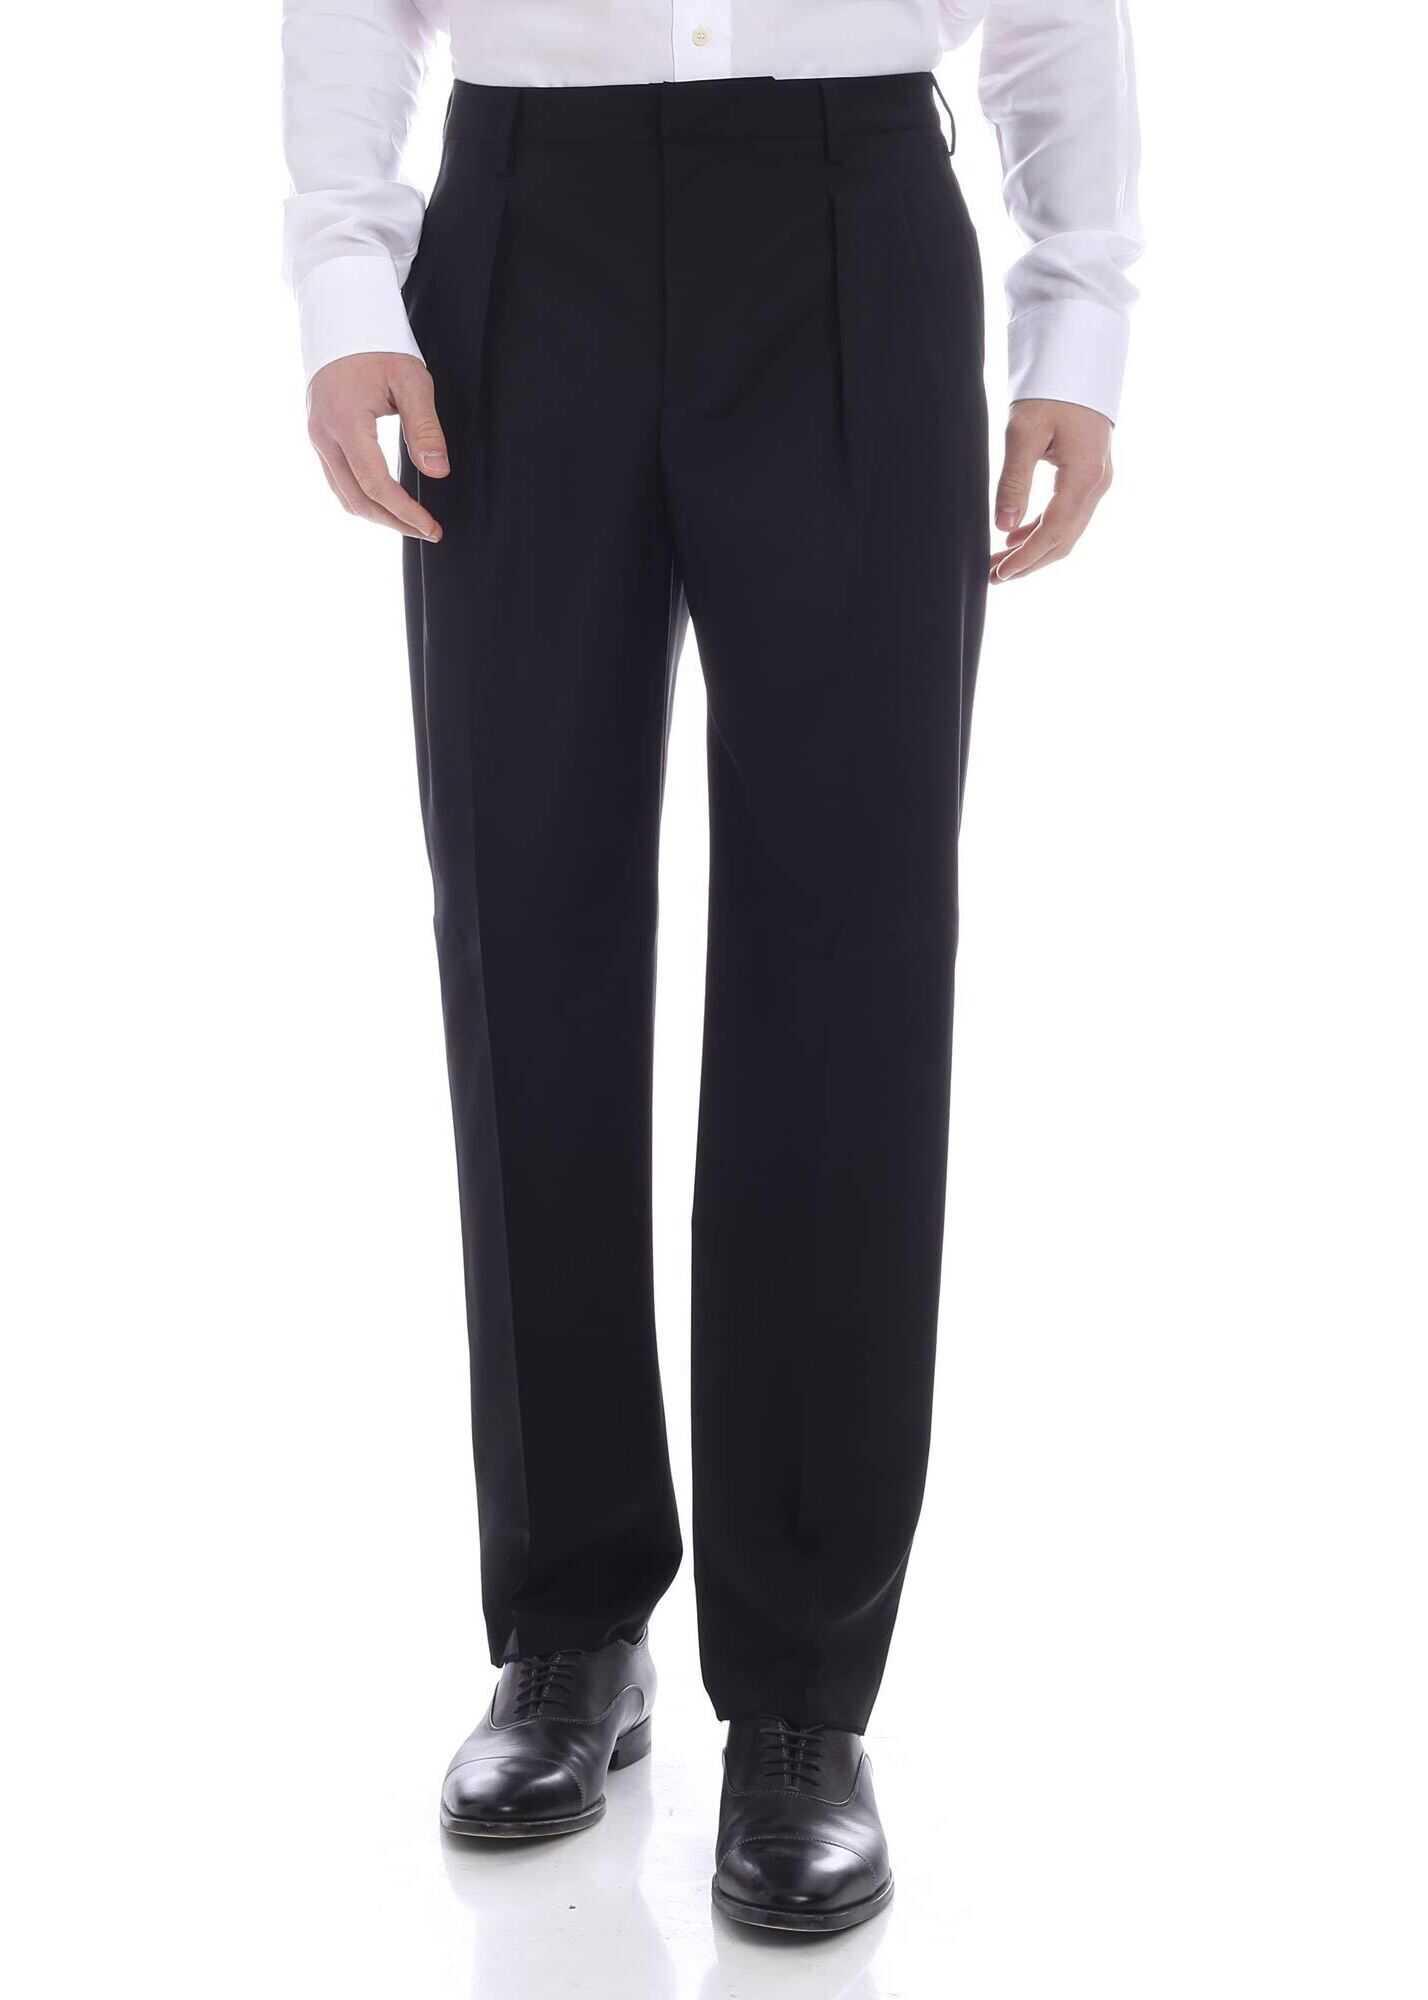 Valentino Garavani Cool Wool Pants In Black Black imagine